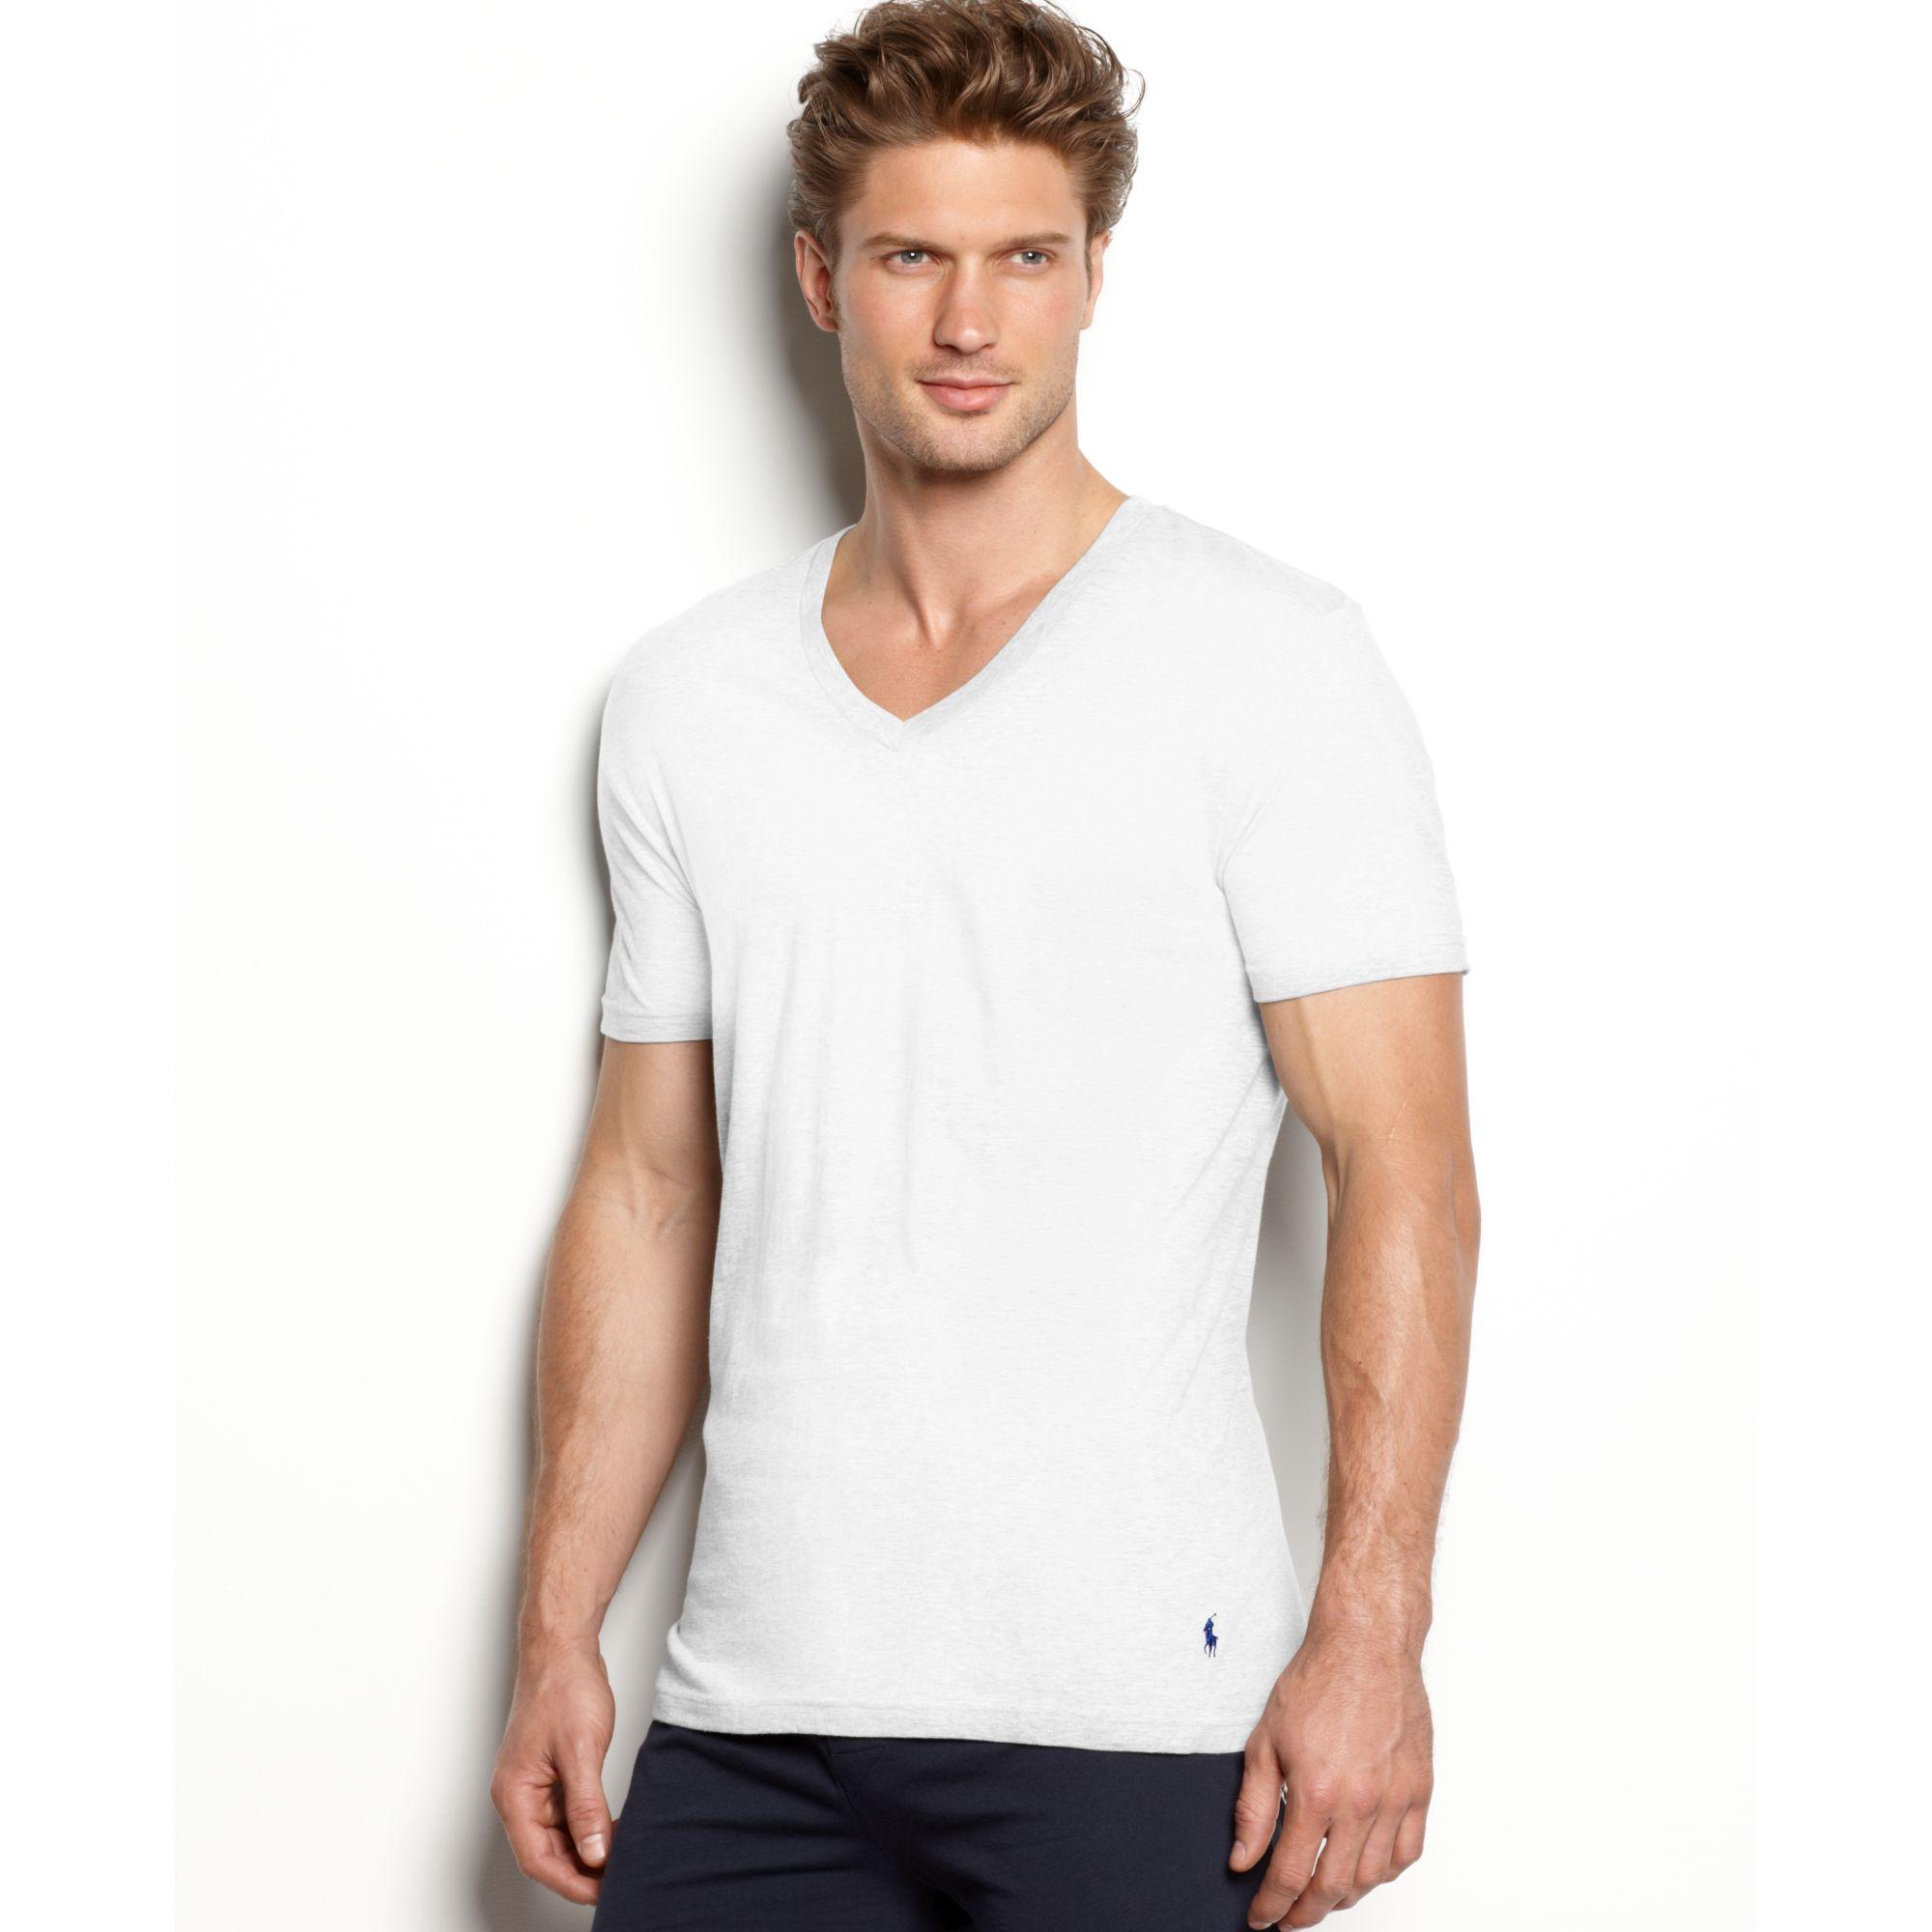 polo ralph lauren cotton v-neck t-shirt (3-pack) cheap white long ... 7d6285e96677